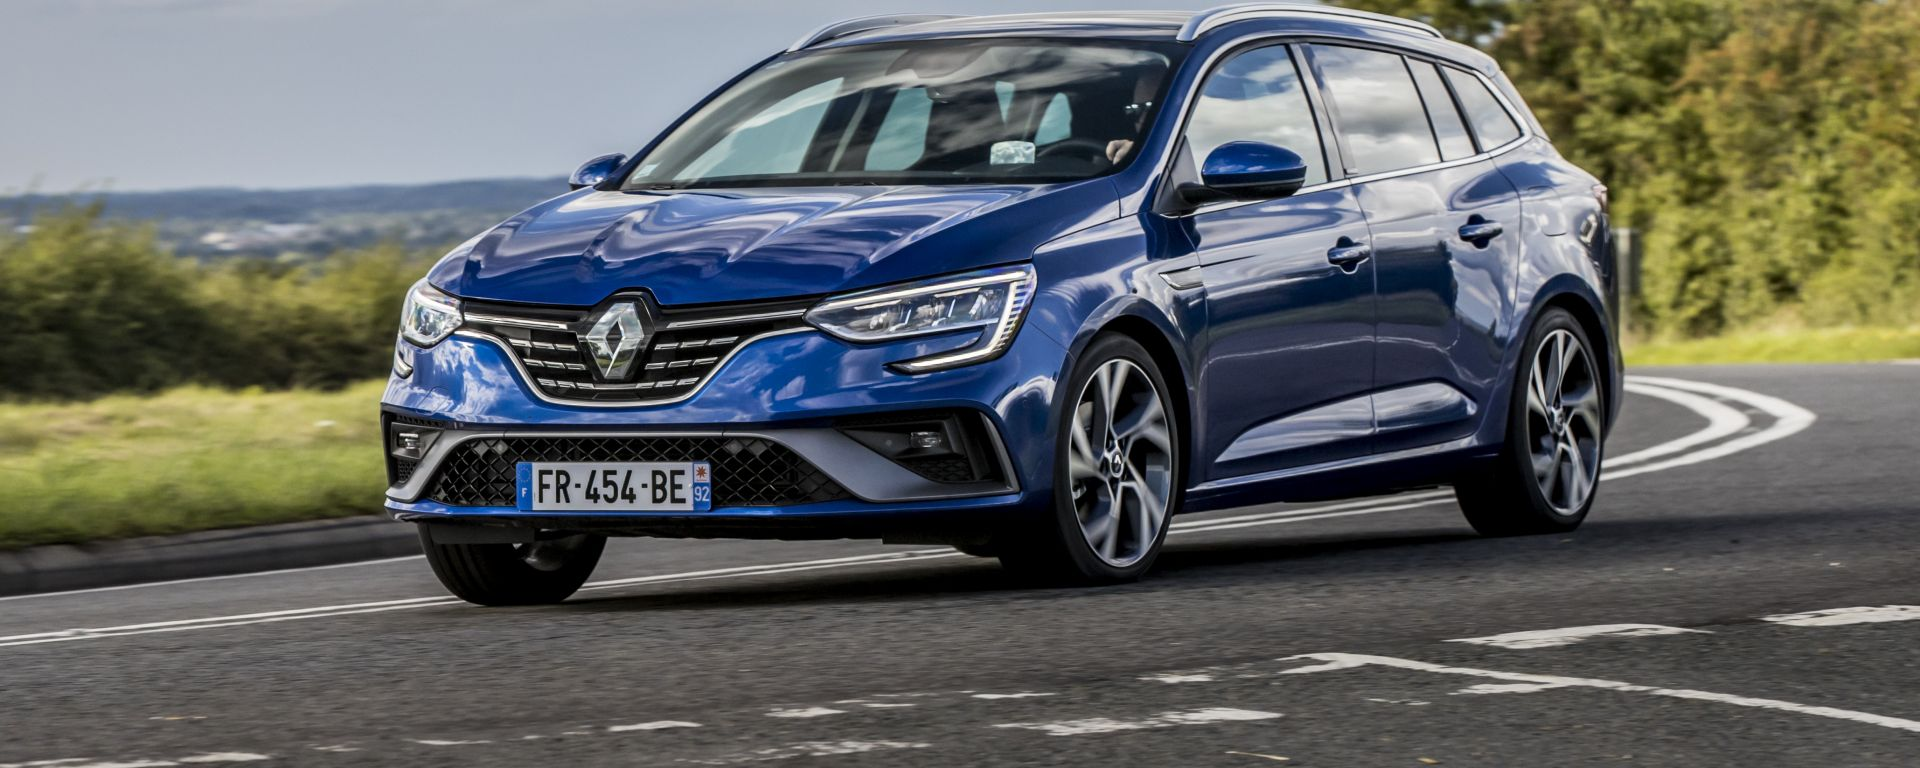 Renault Megane Sporter E-Tech 2021: familiare plug-in hybrid